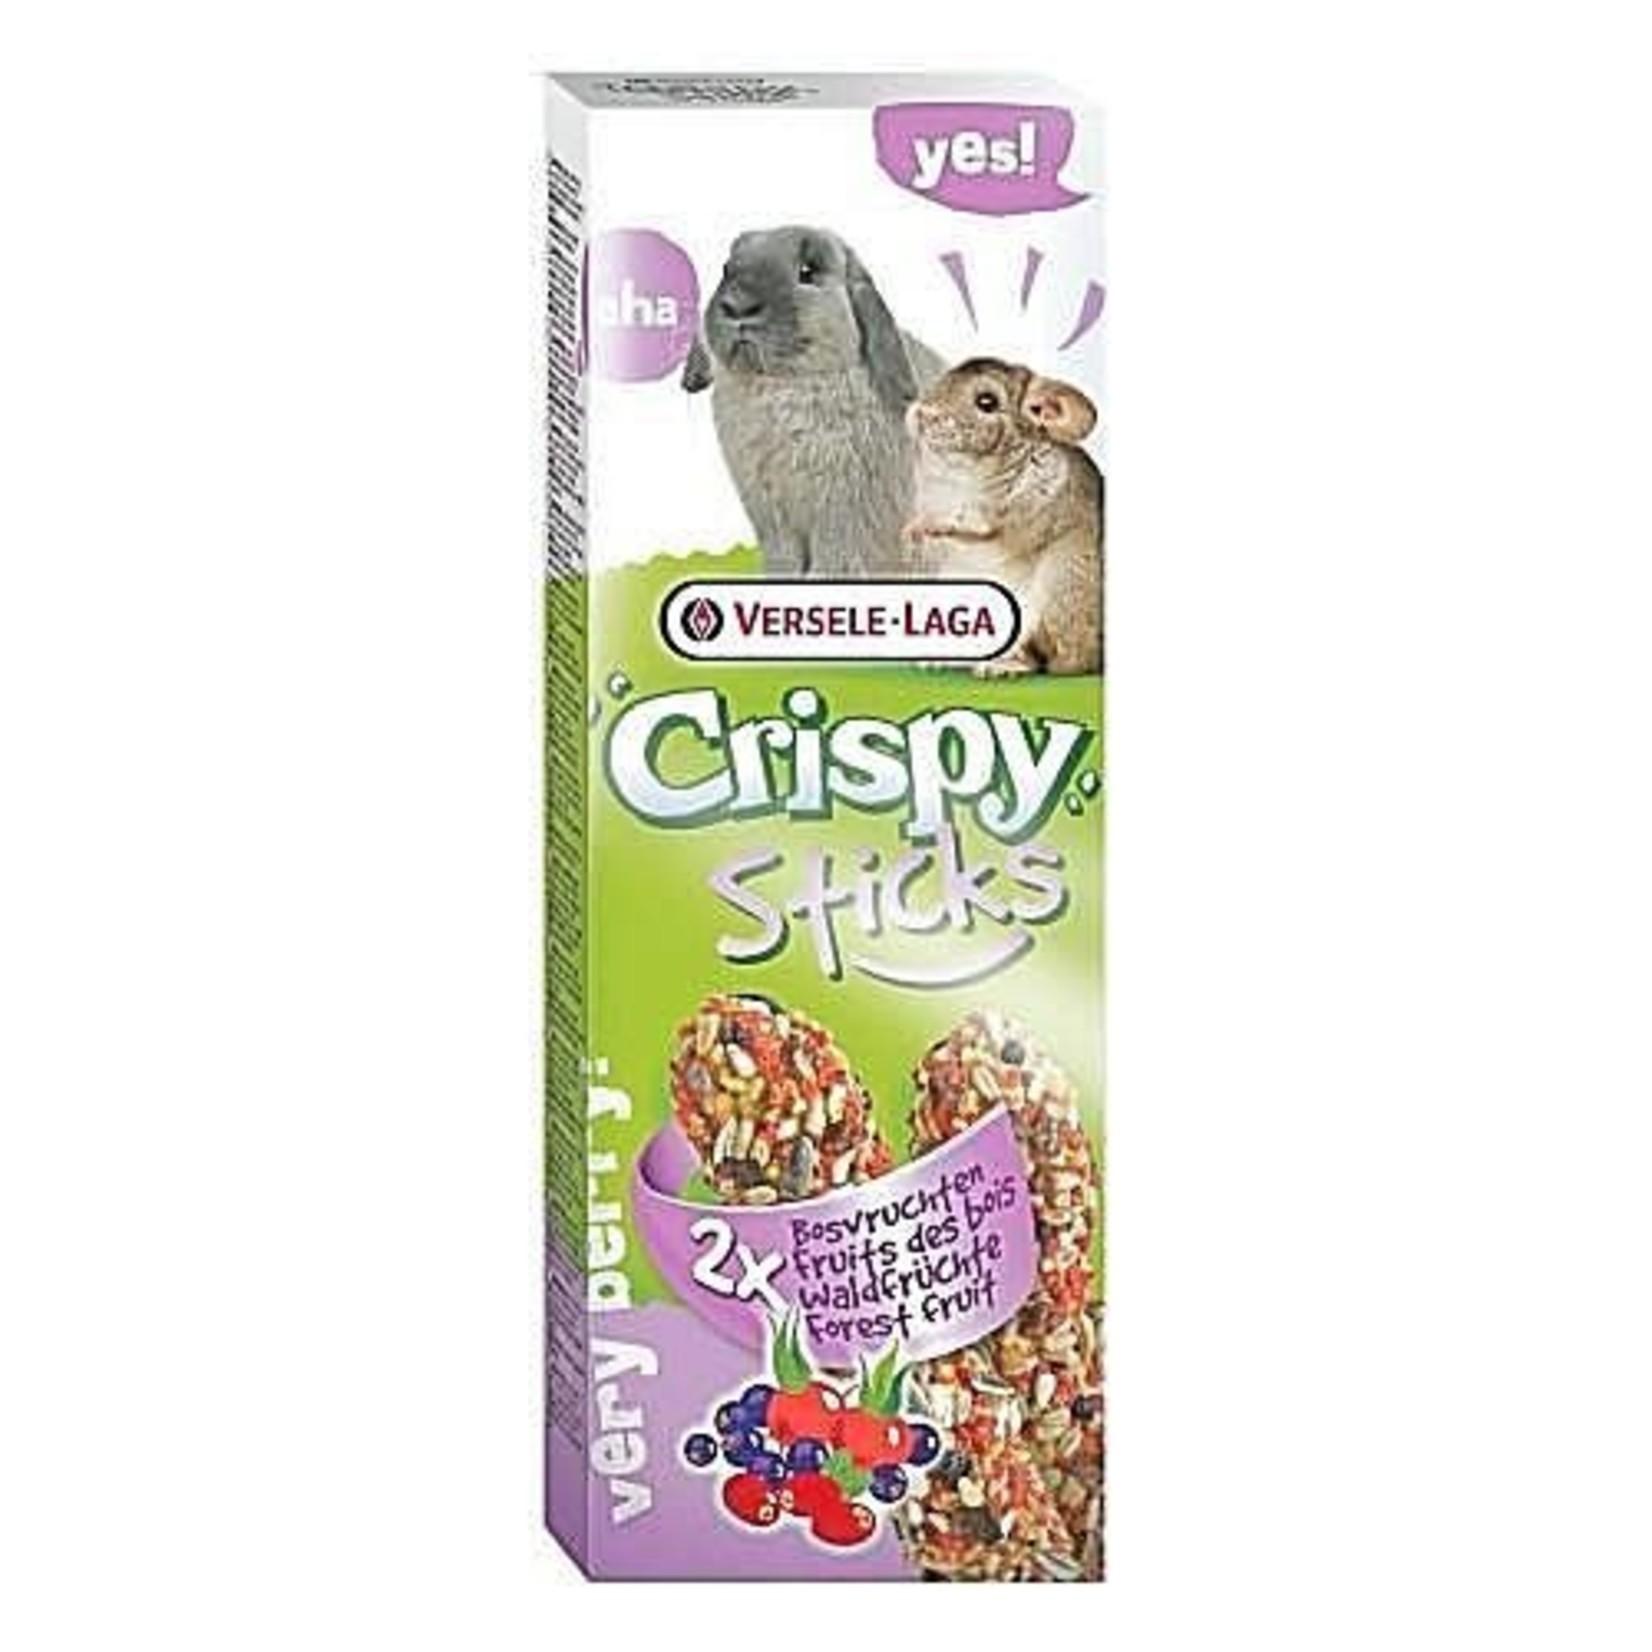 Versele-Laga Crispy Sticks Fruit 2x55g